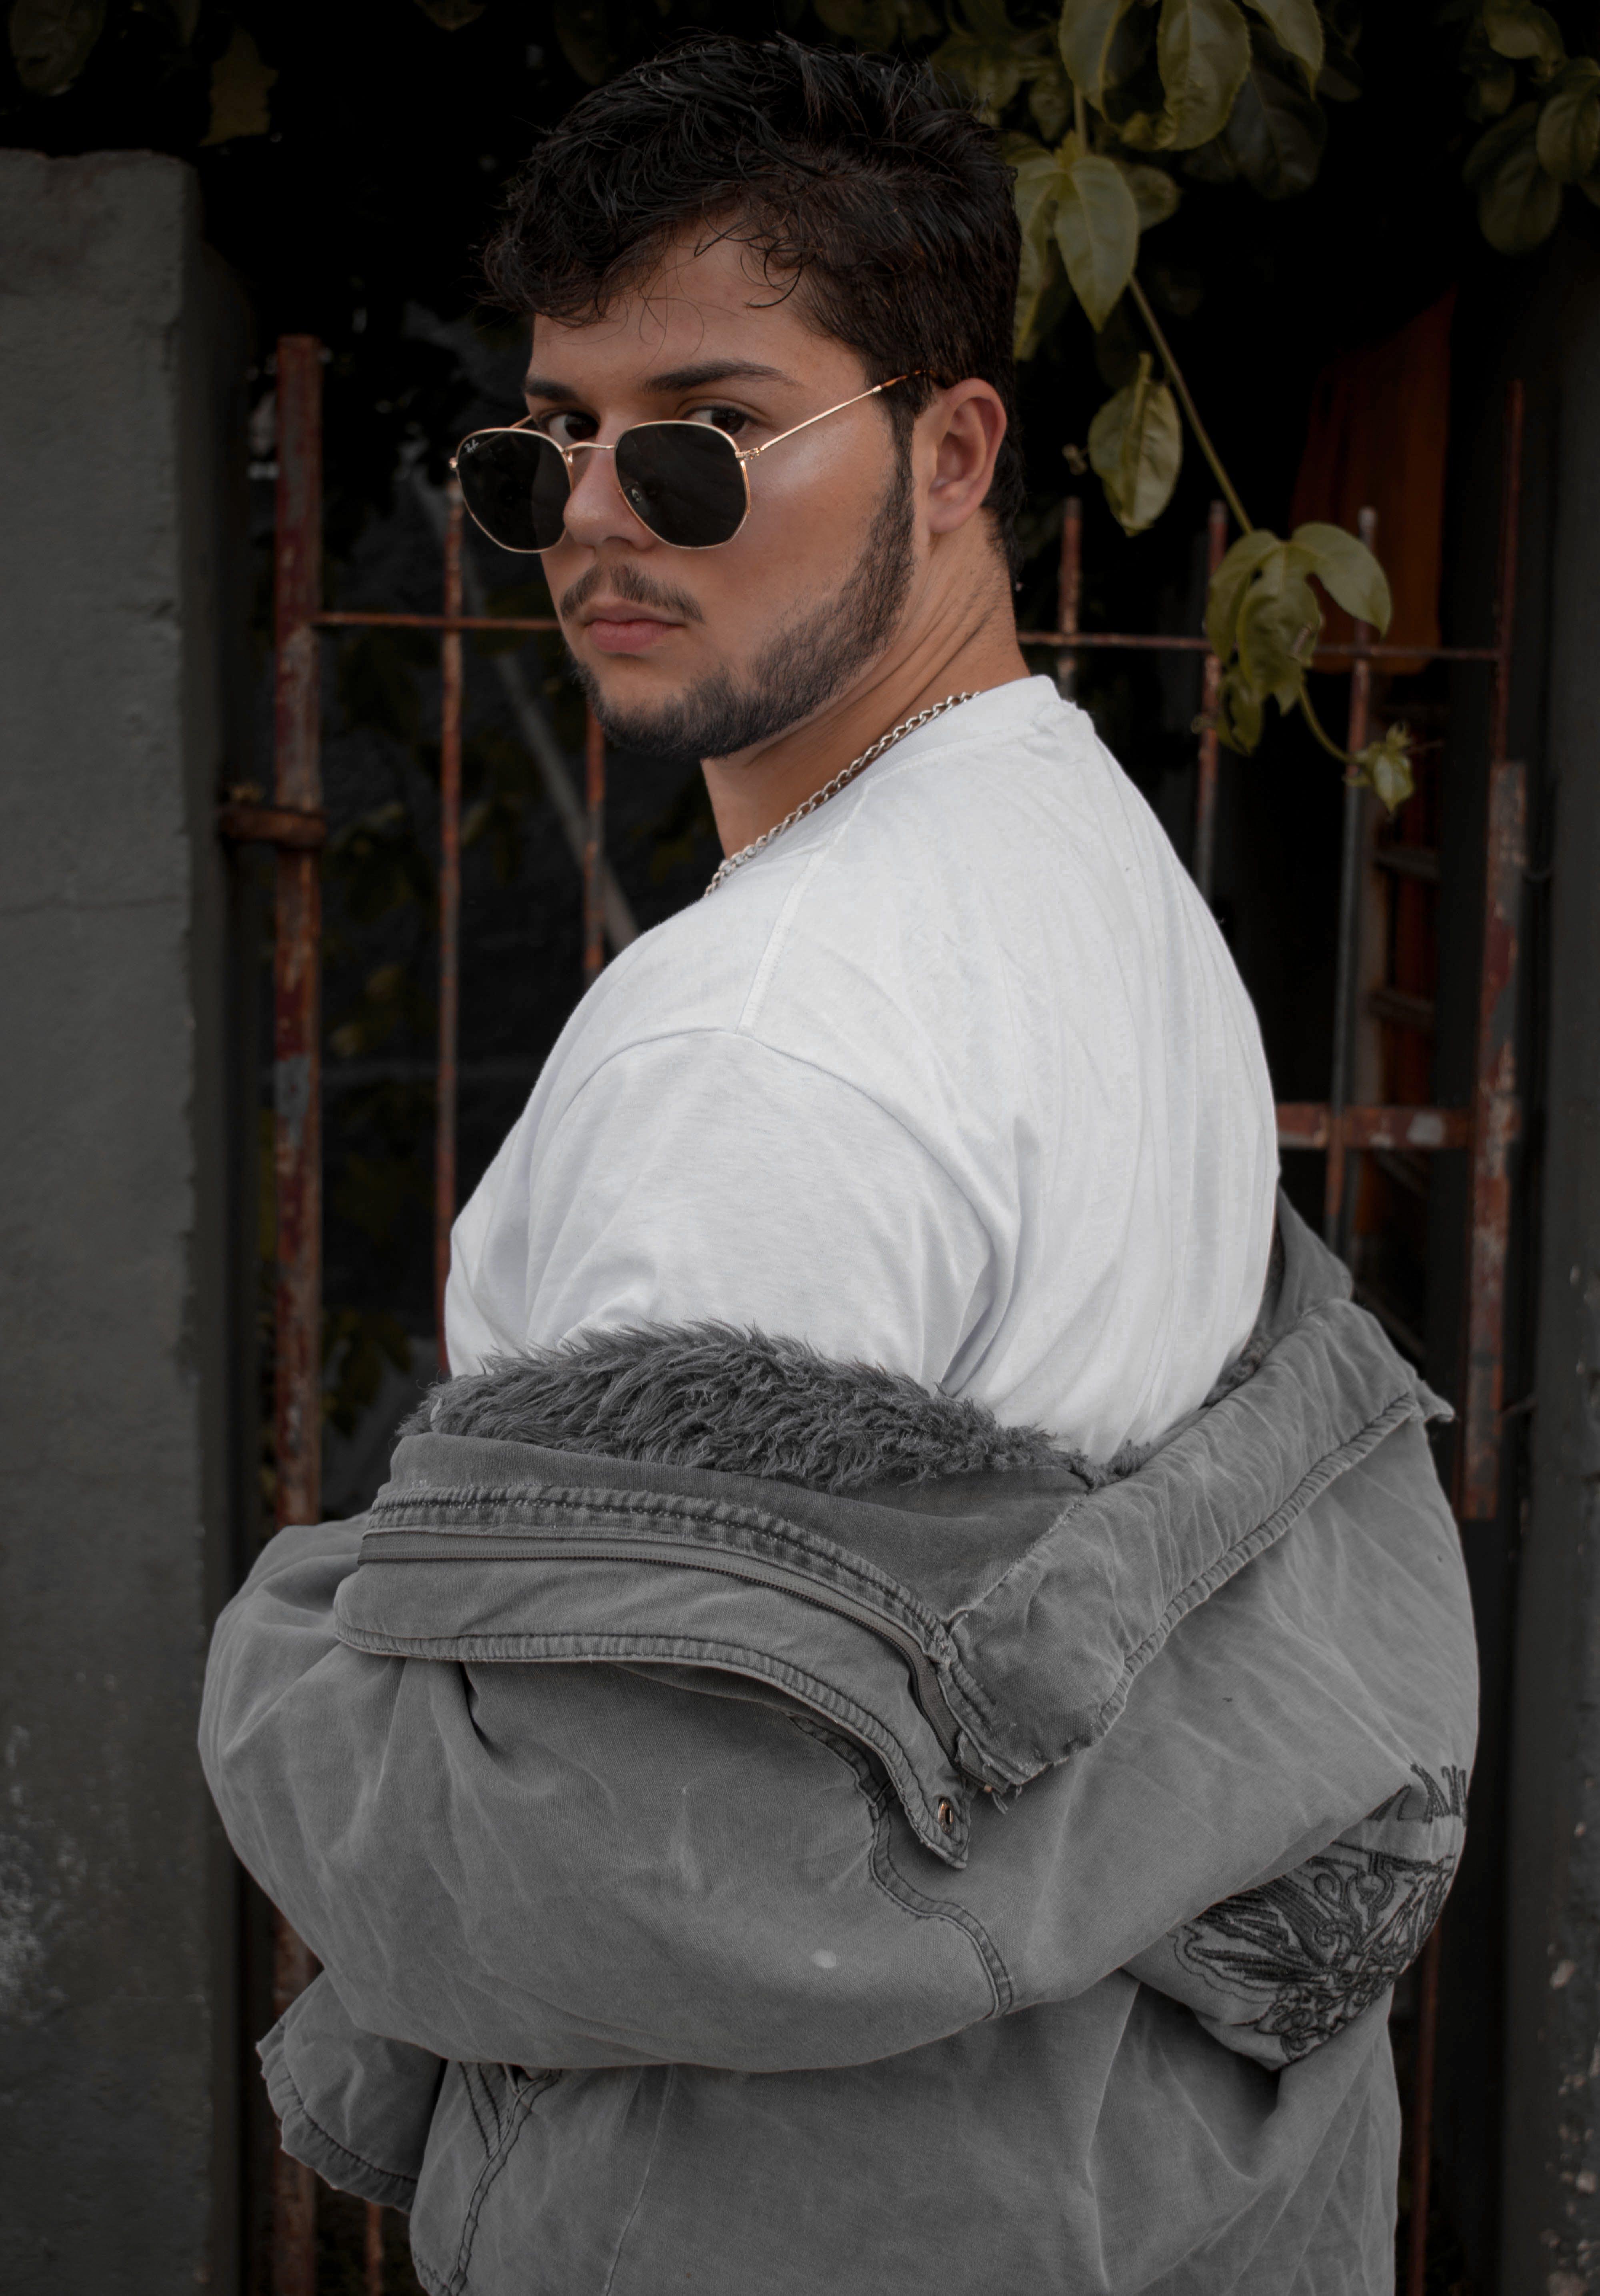 Free stock photo of 20-25 years old man, alfresco, big, brunette